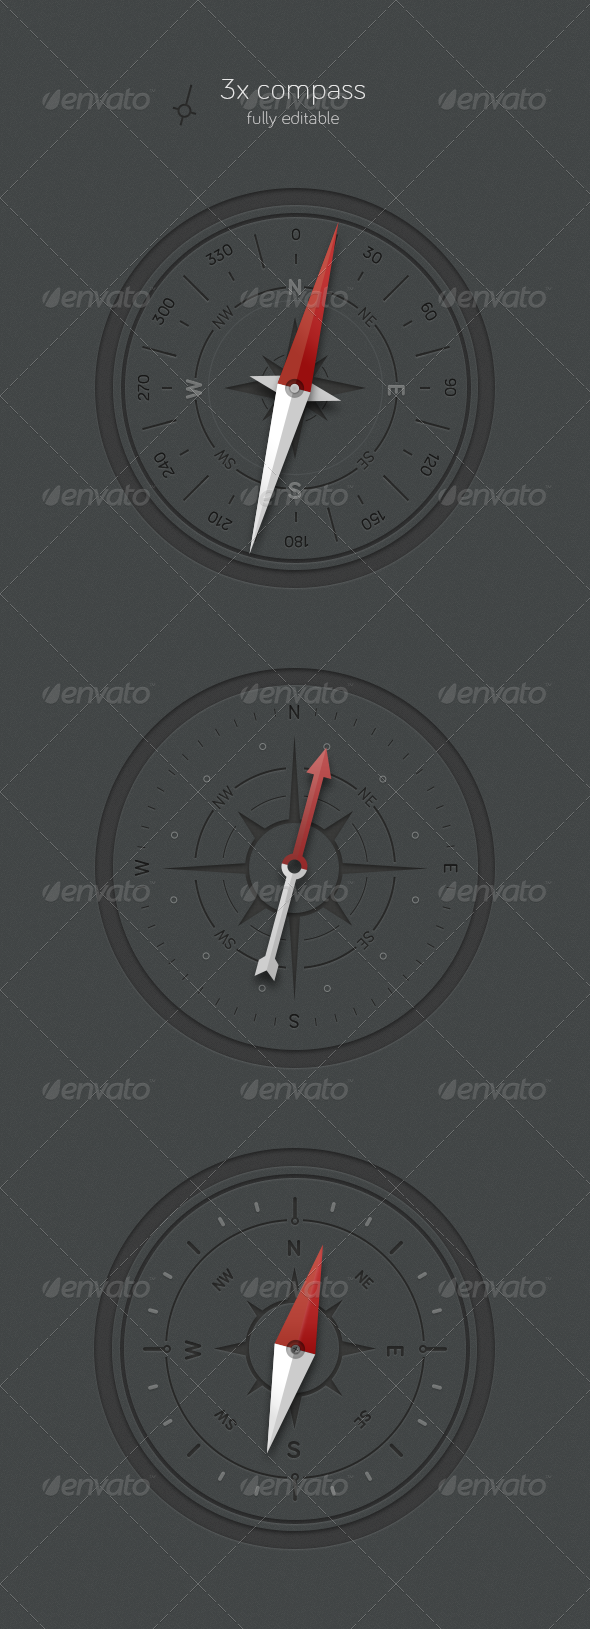 GraphicRiver 3x Compass 4072960